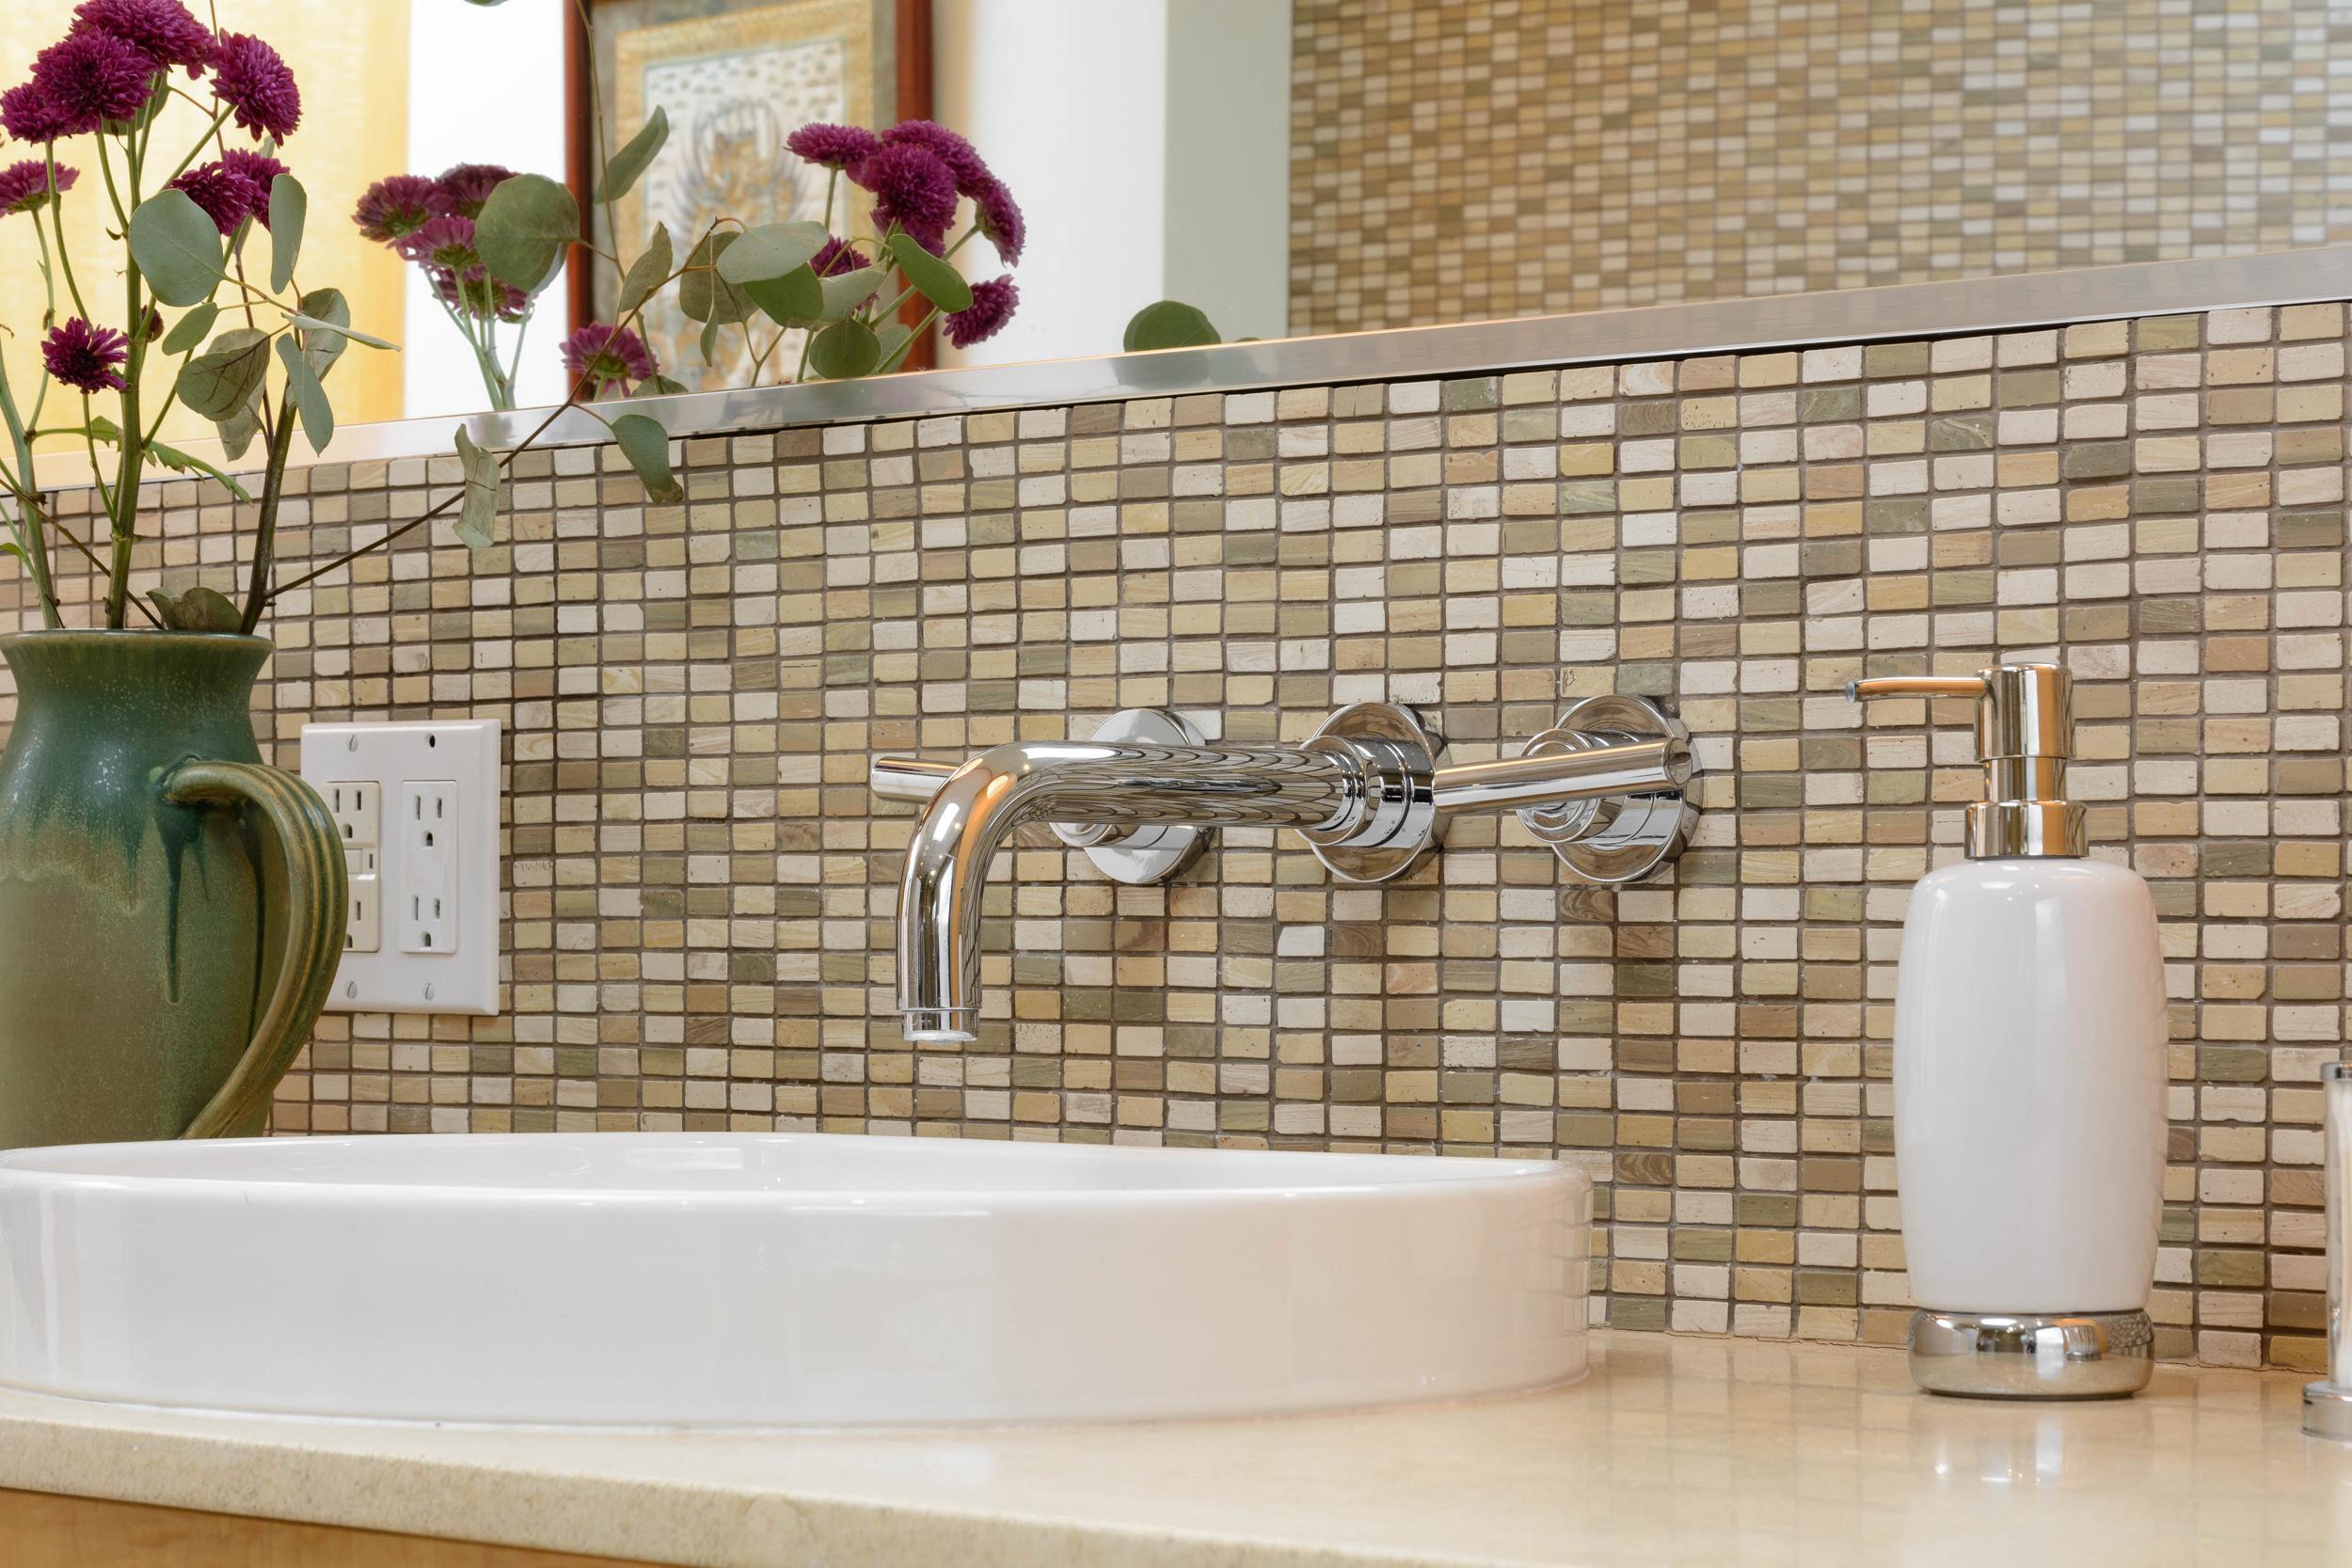 Claremont-Spa-Master-Bath-Mosaic-Tile-Backsplash-Wall-Fixture.jpg